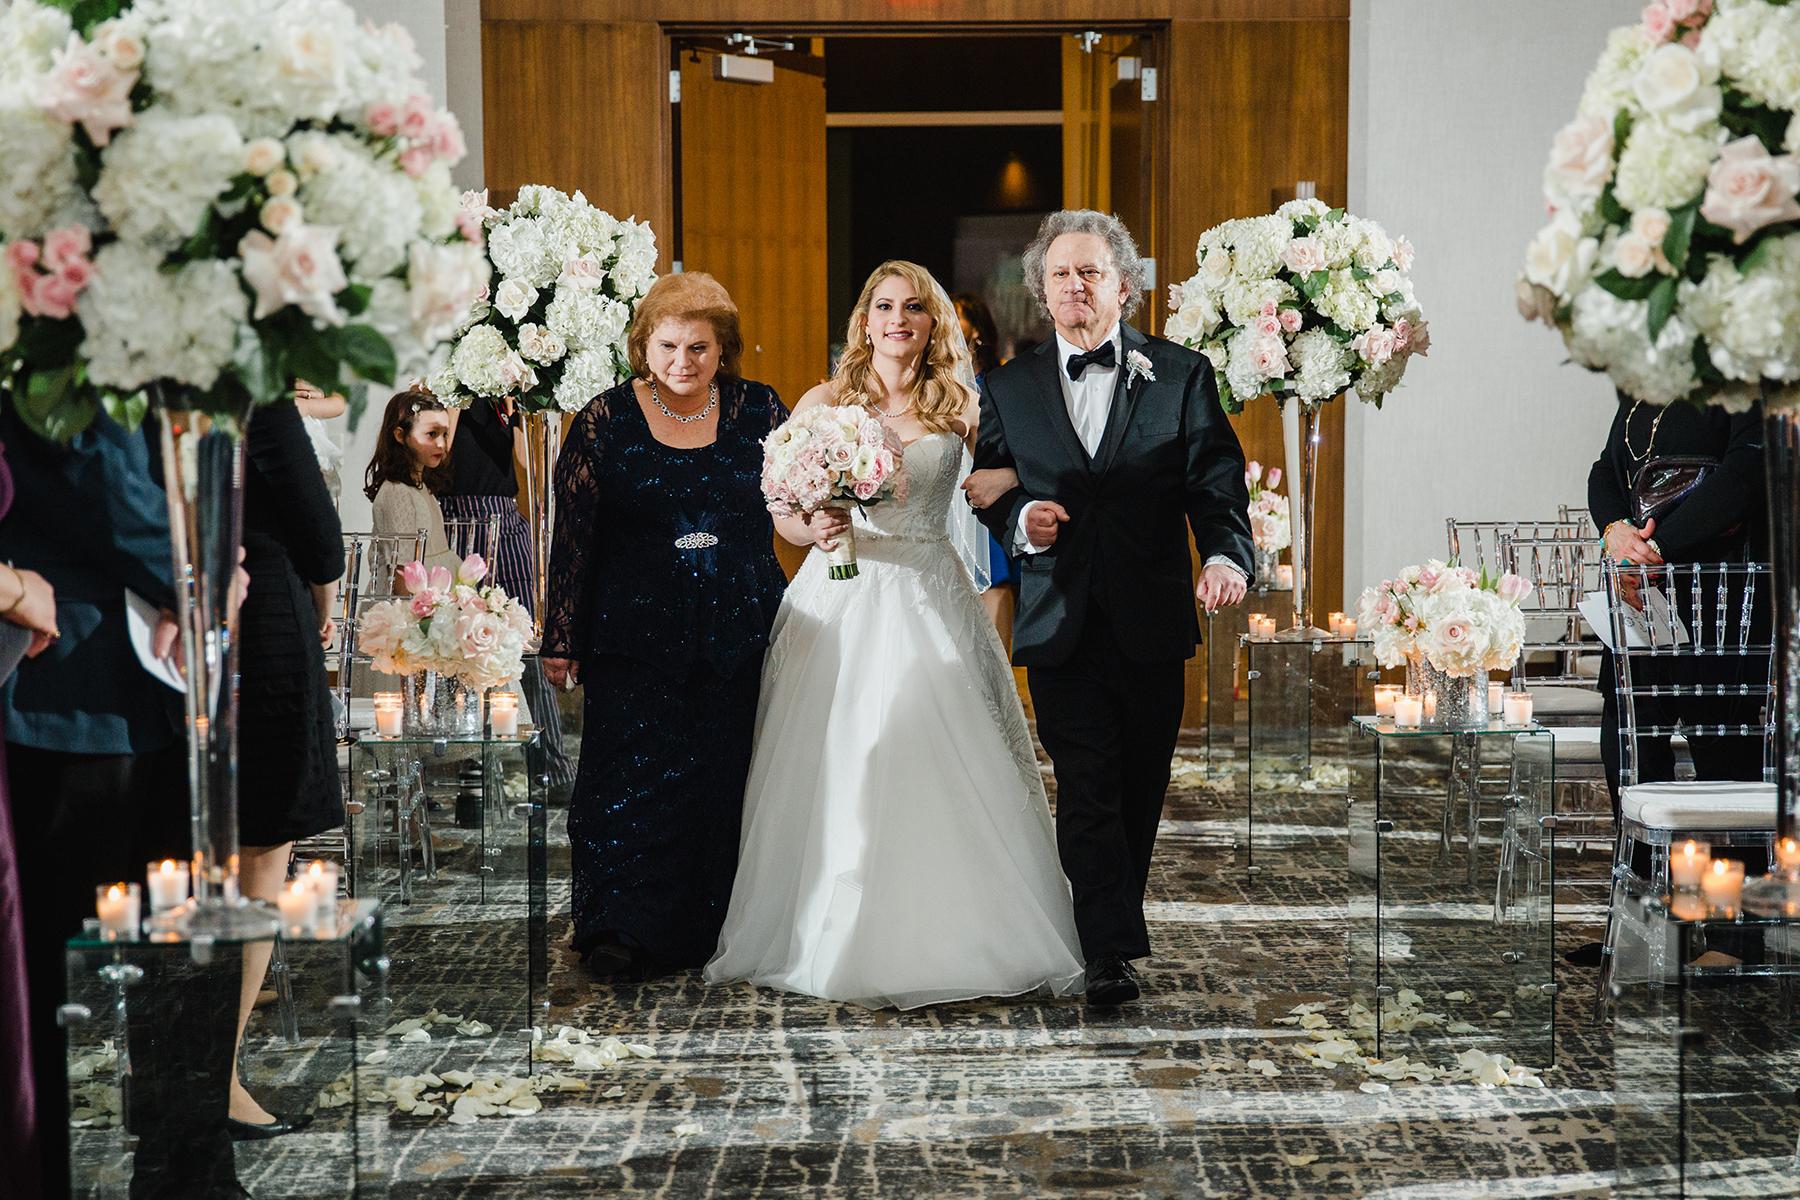 Traci_and_Ryan_Wedding-342.jpg